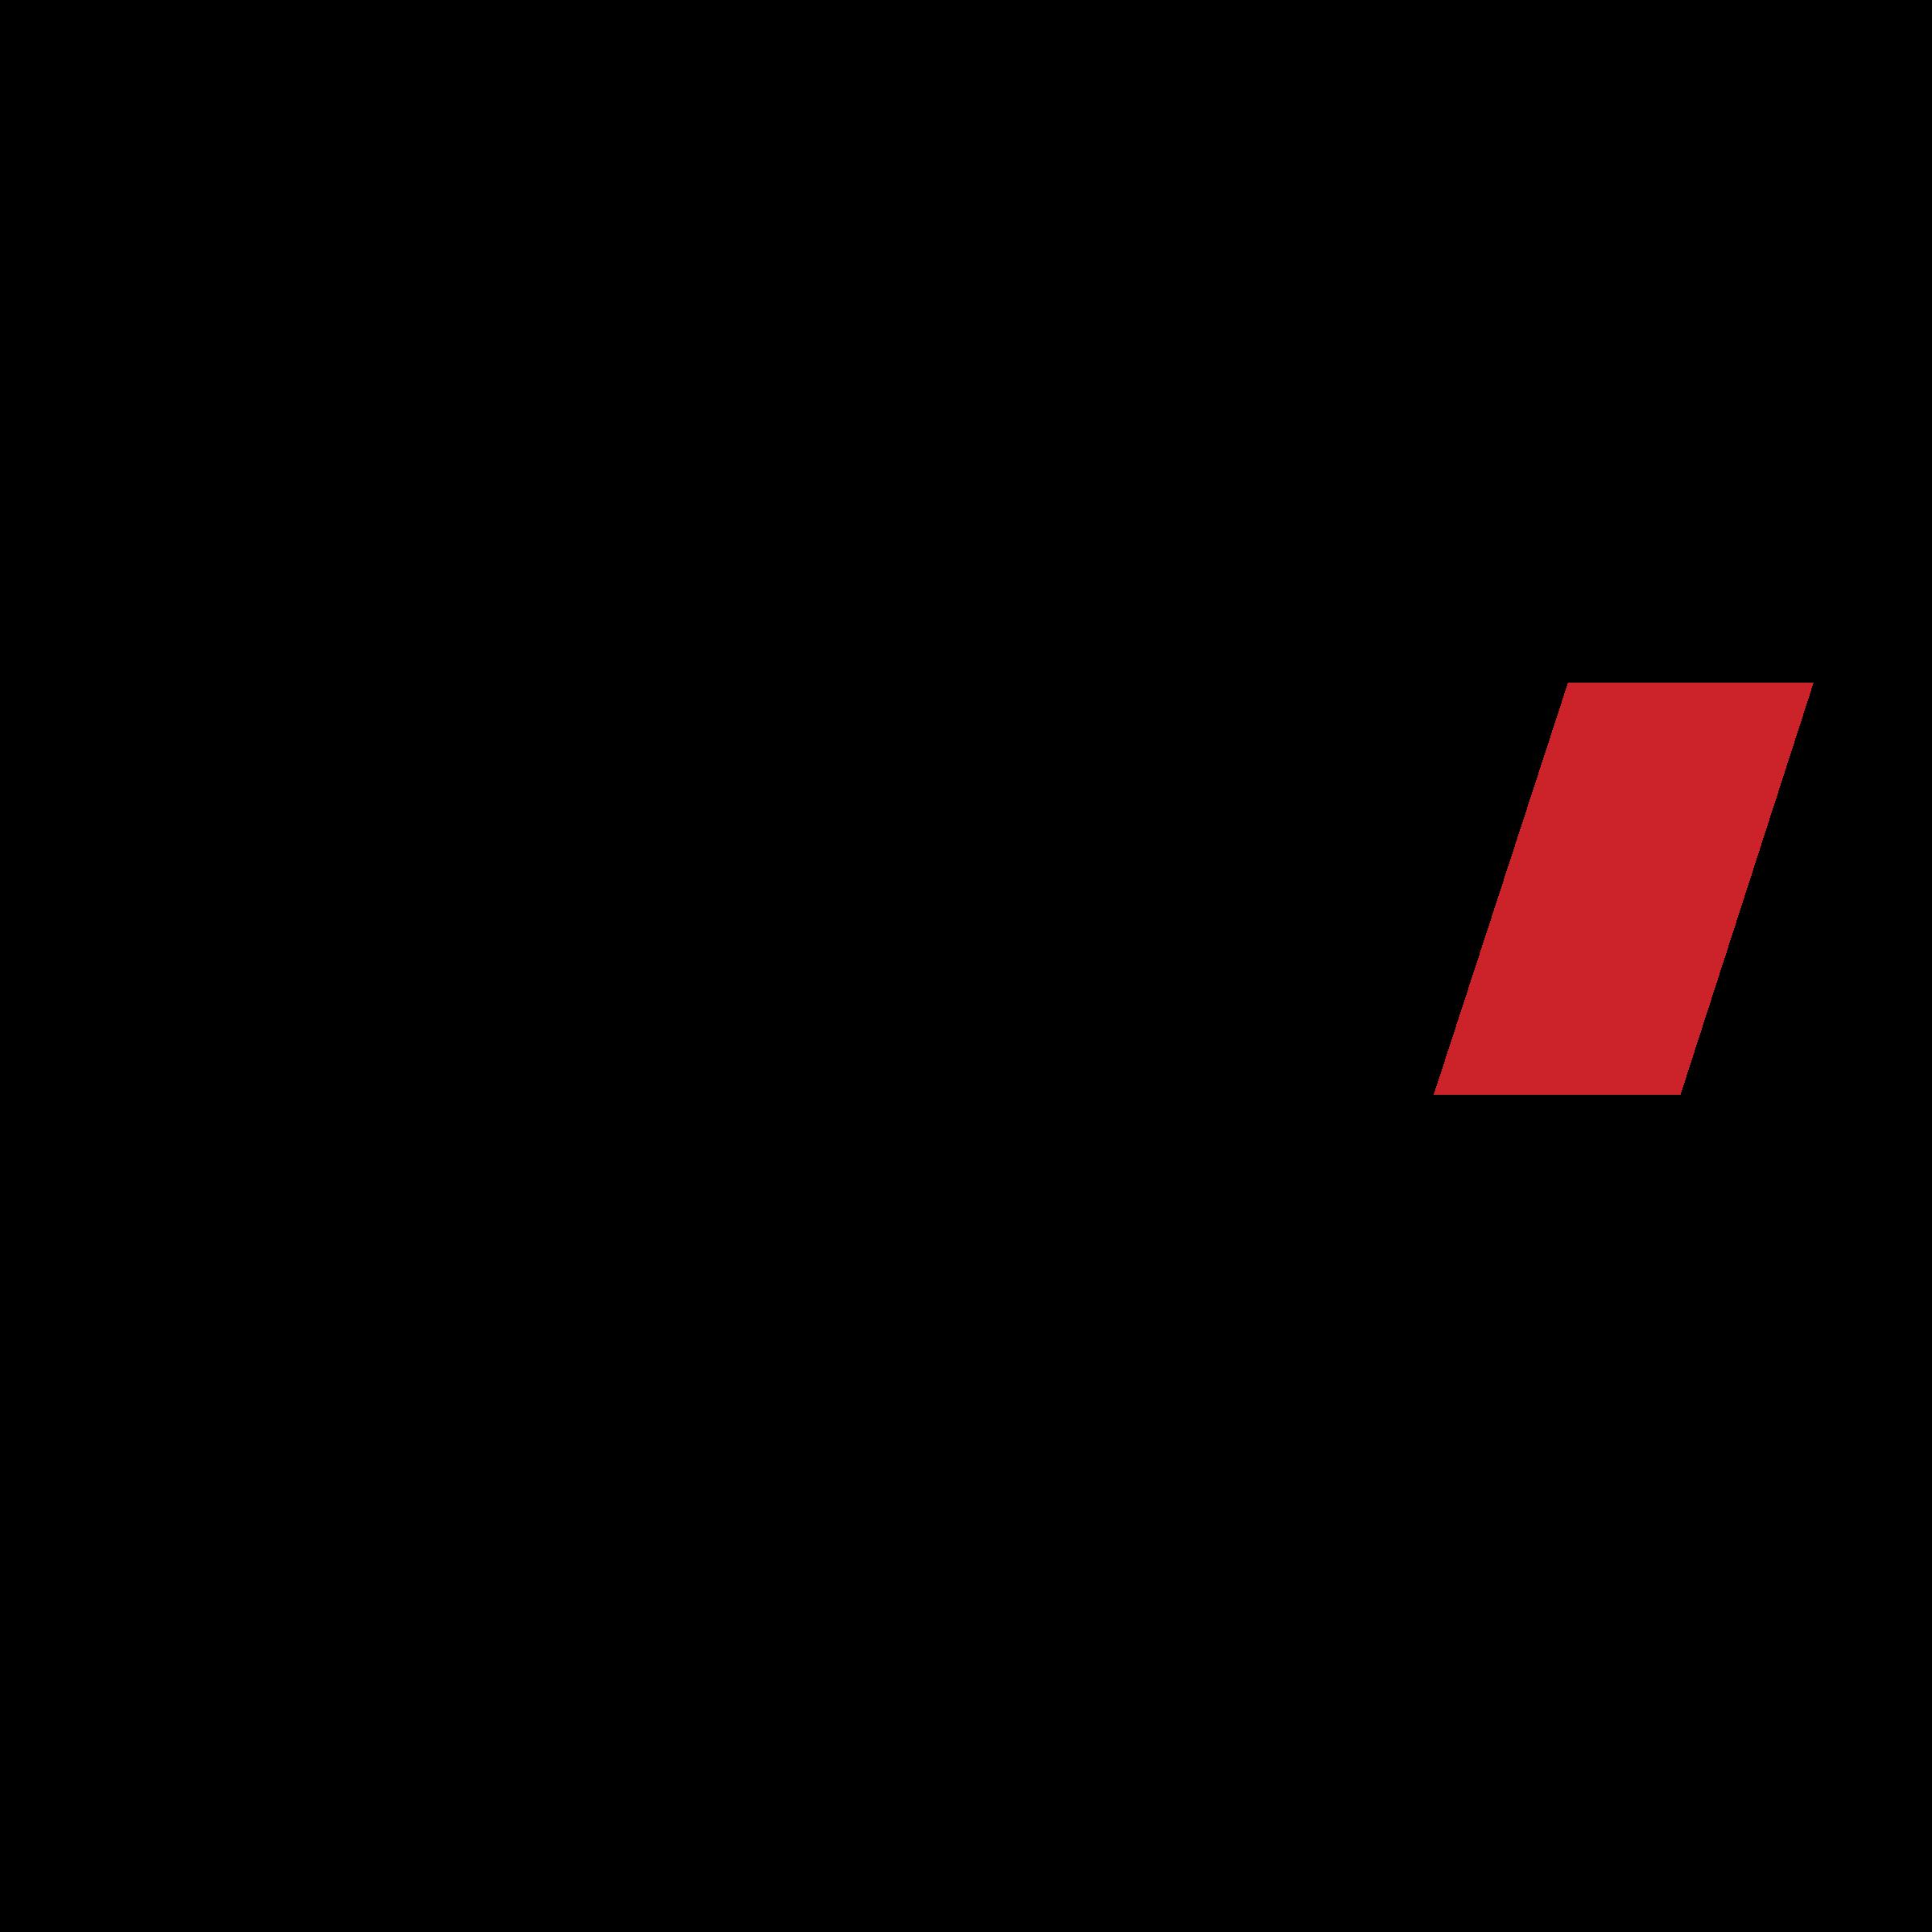 Advanced Auto Parts 01 Logo Png Transparent Svg Vector Freebie